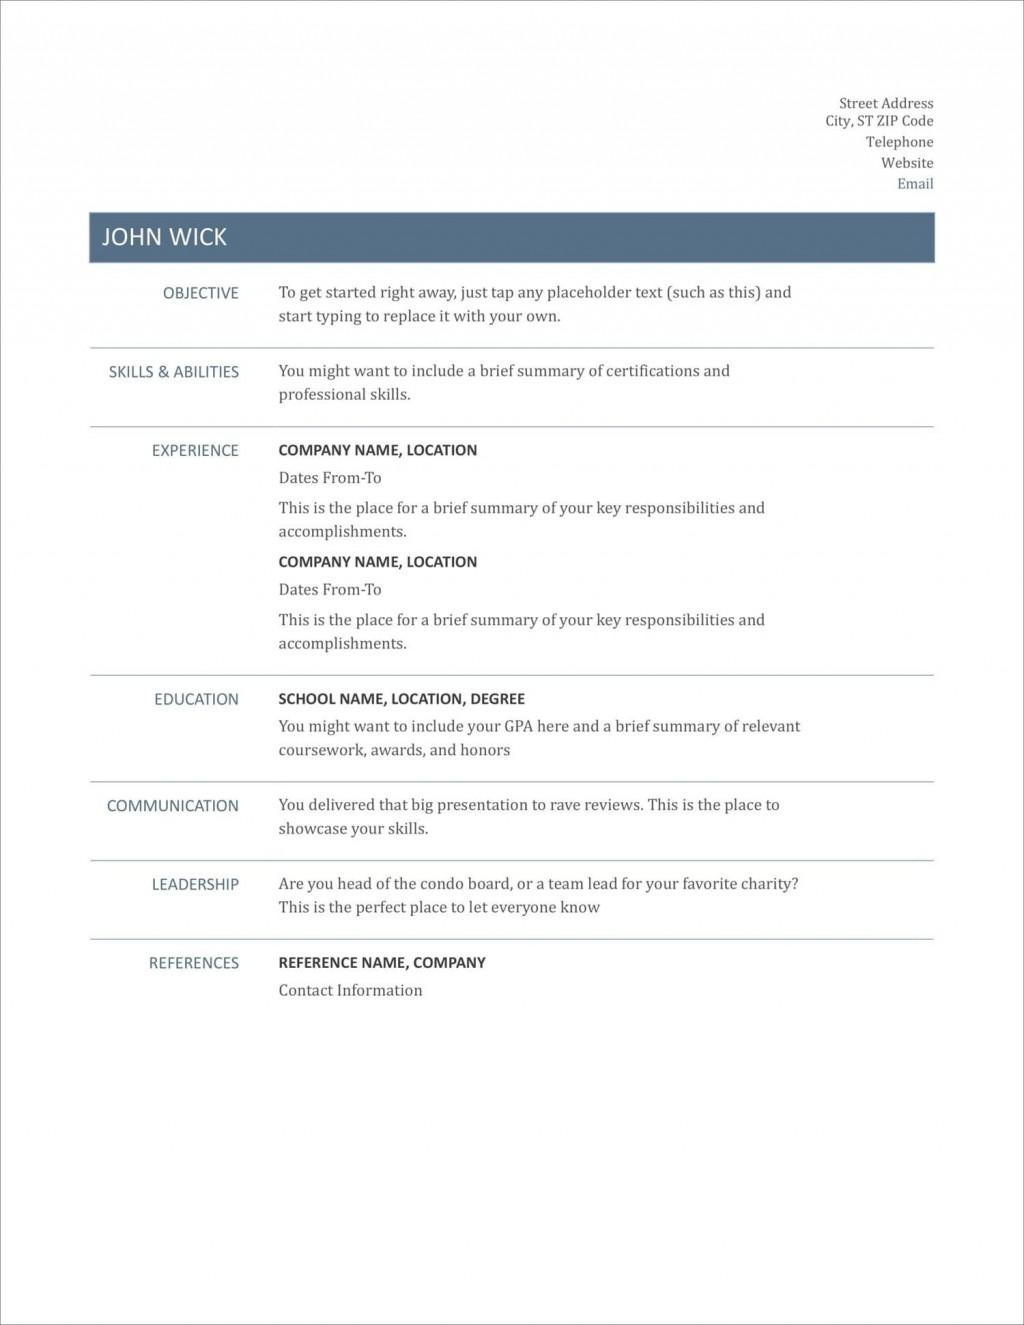 005 Striking Free Printable Resume Template Australia Photo Large